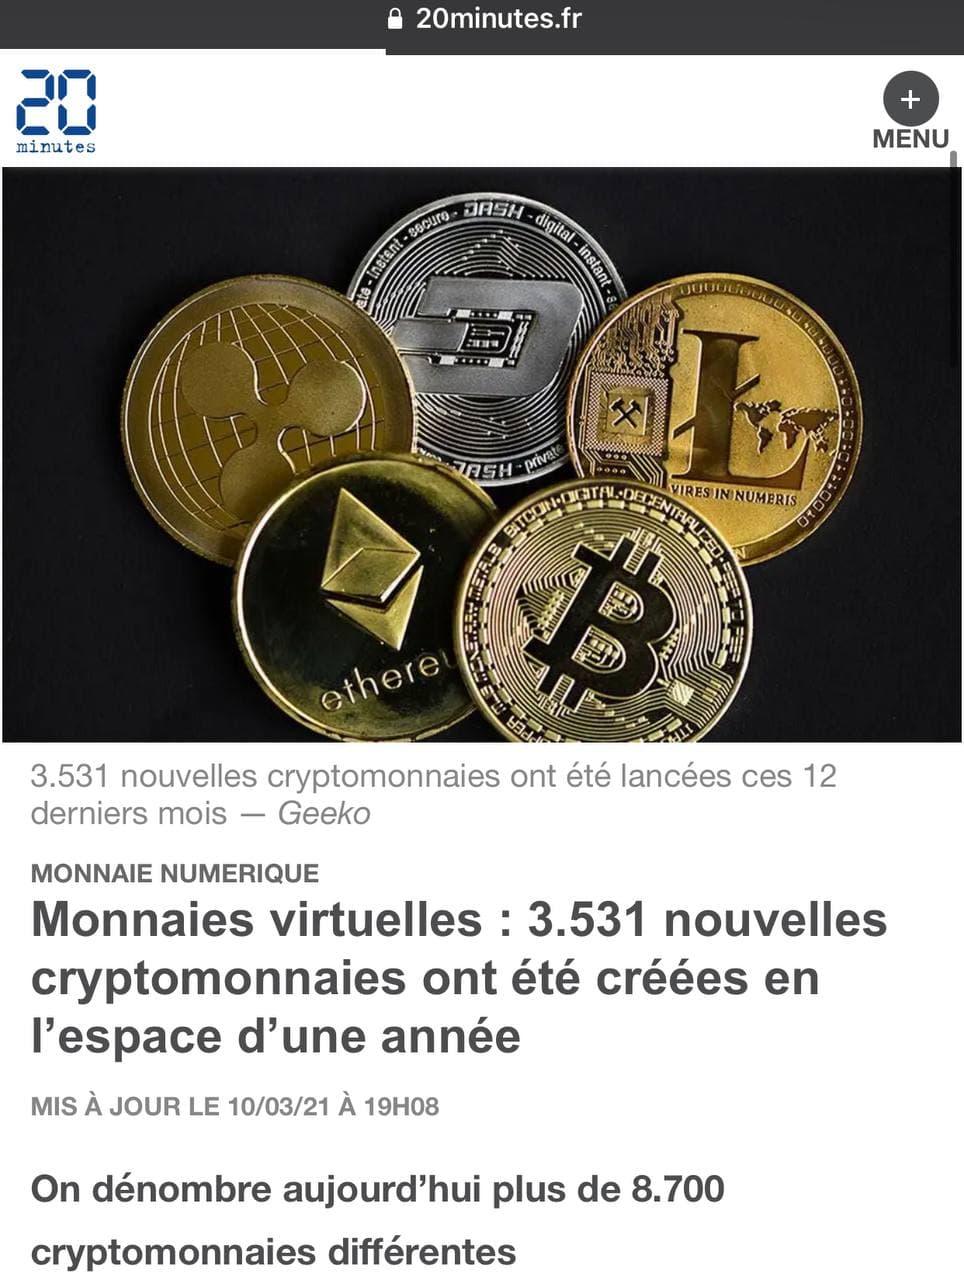 Cryptomonnaies la ruée vers l'or